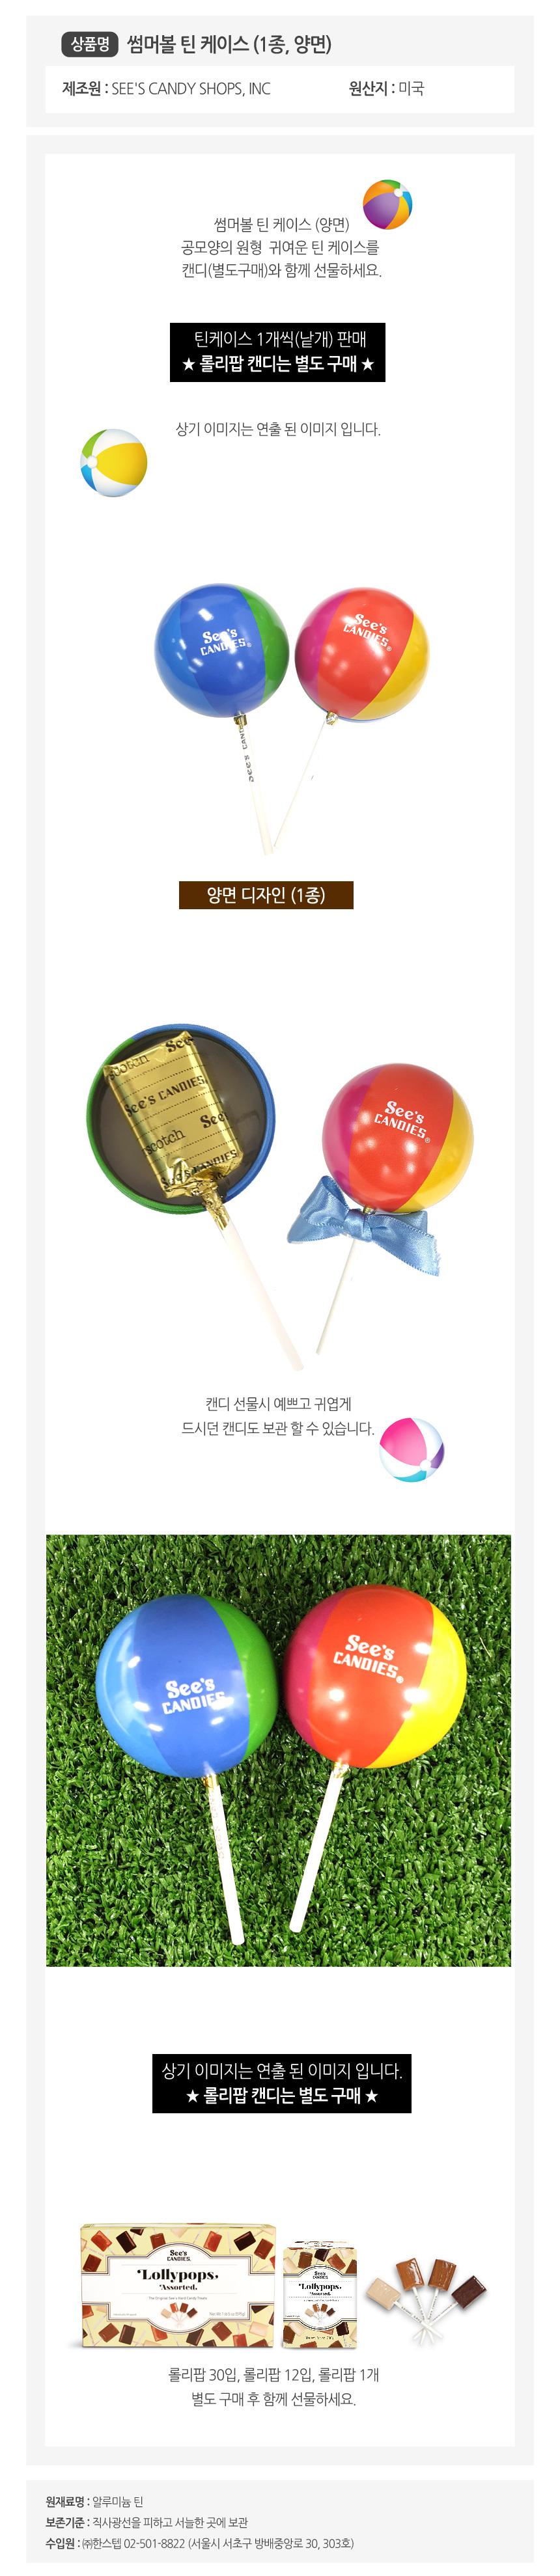 lollypops_tin_ball_summer.jpg